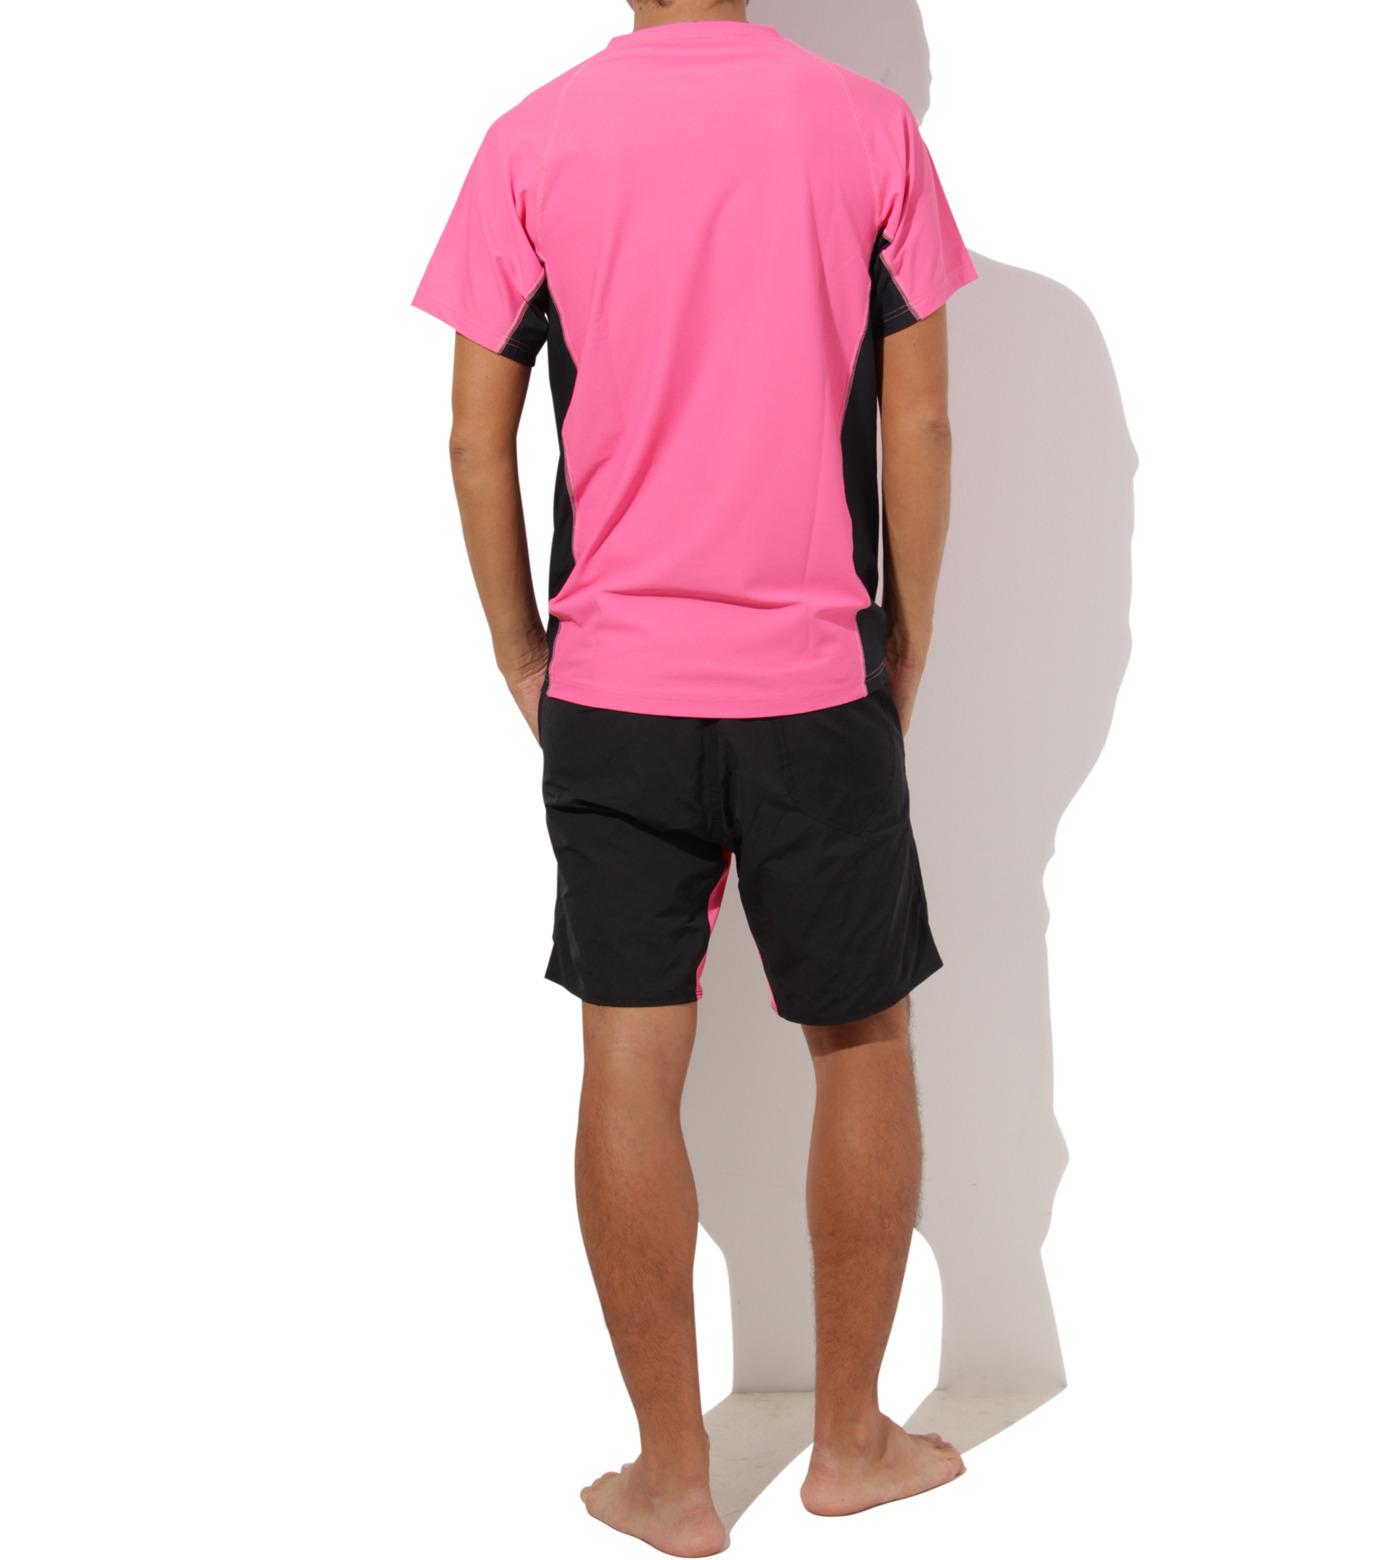 TWO TWO ONE(トゥートゥーワン)のSurf shorts short-PINK(SWIMWEAR/SWIMWEAR)-15N948001-72 拡大詳細画像6